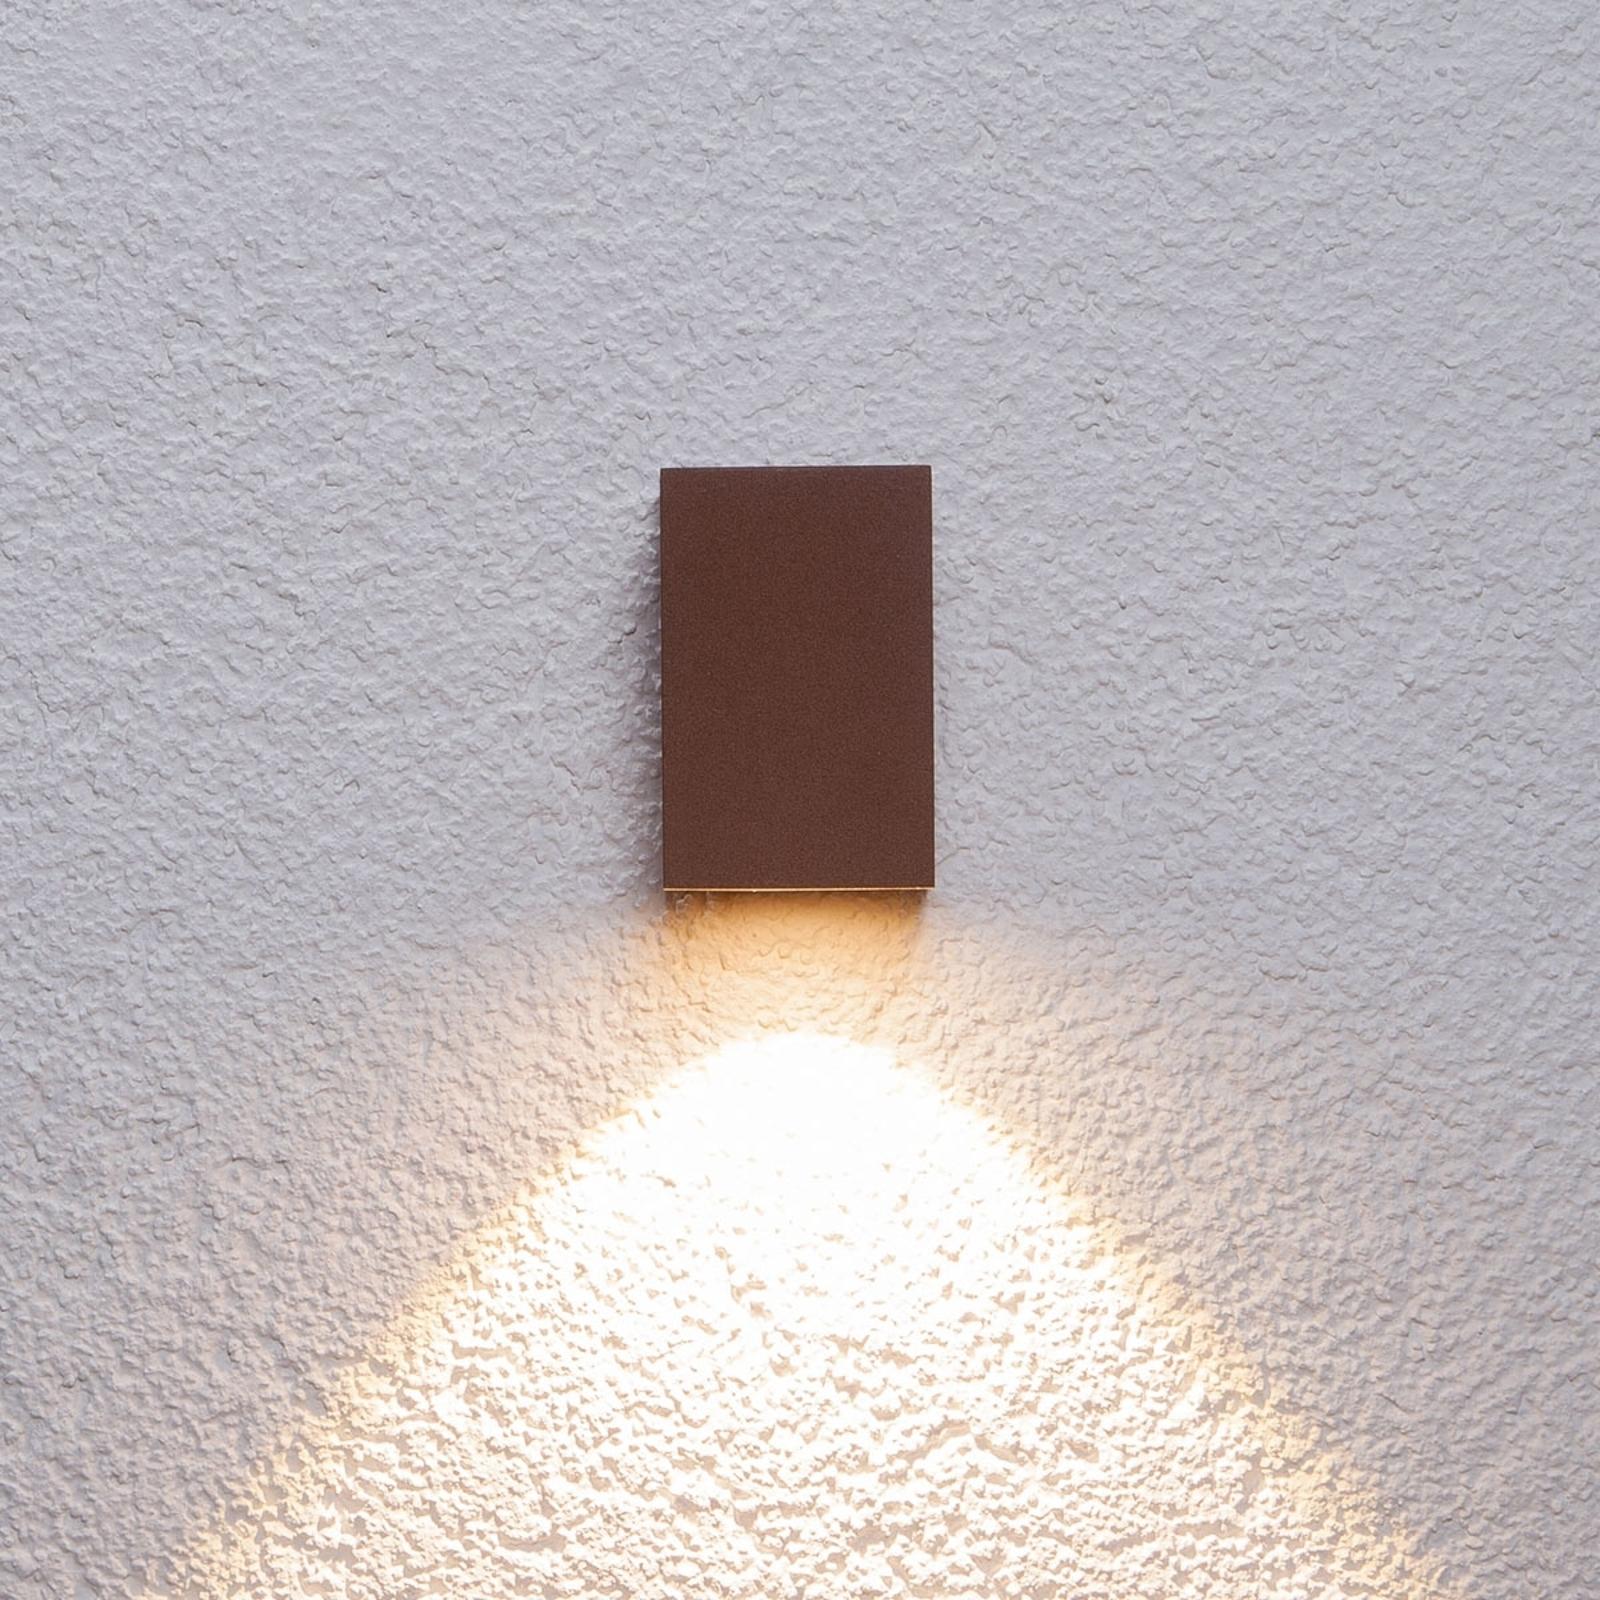 Roestbruine led-buitenwandlamp Tavi, 9,5 cm